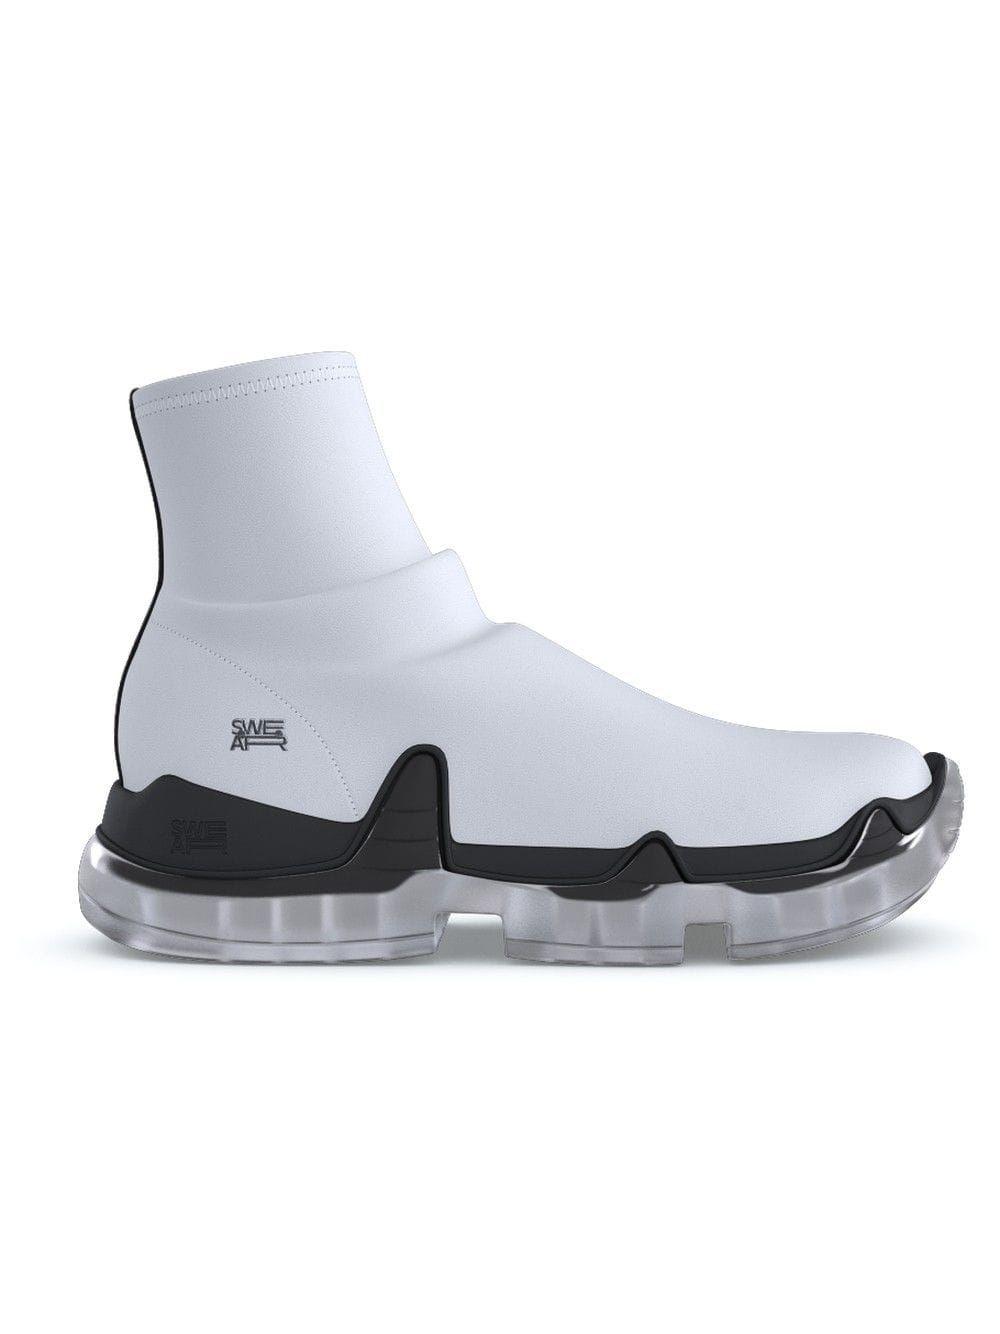 Swear x UglyWorldwide Air Rev. Trigger hi top Sneakers